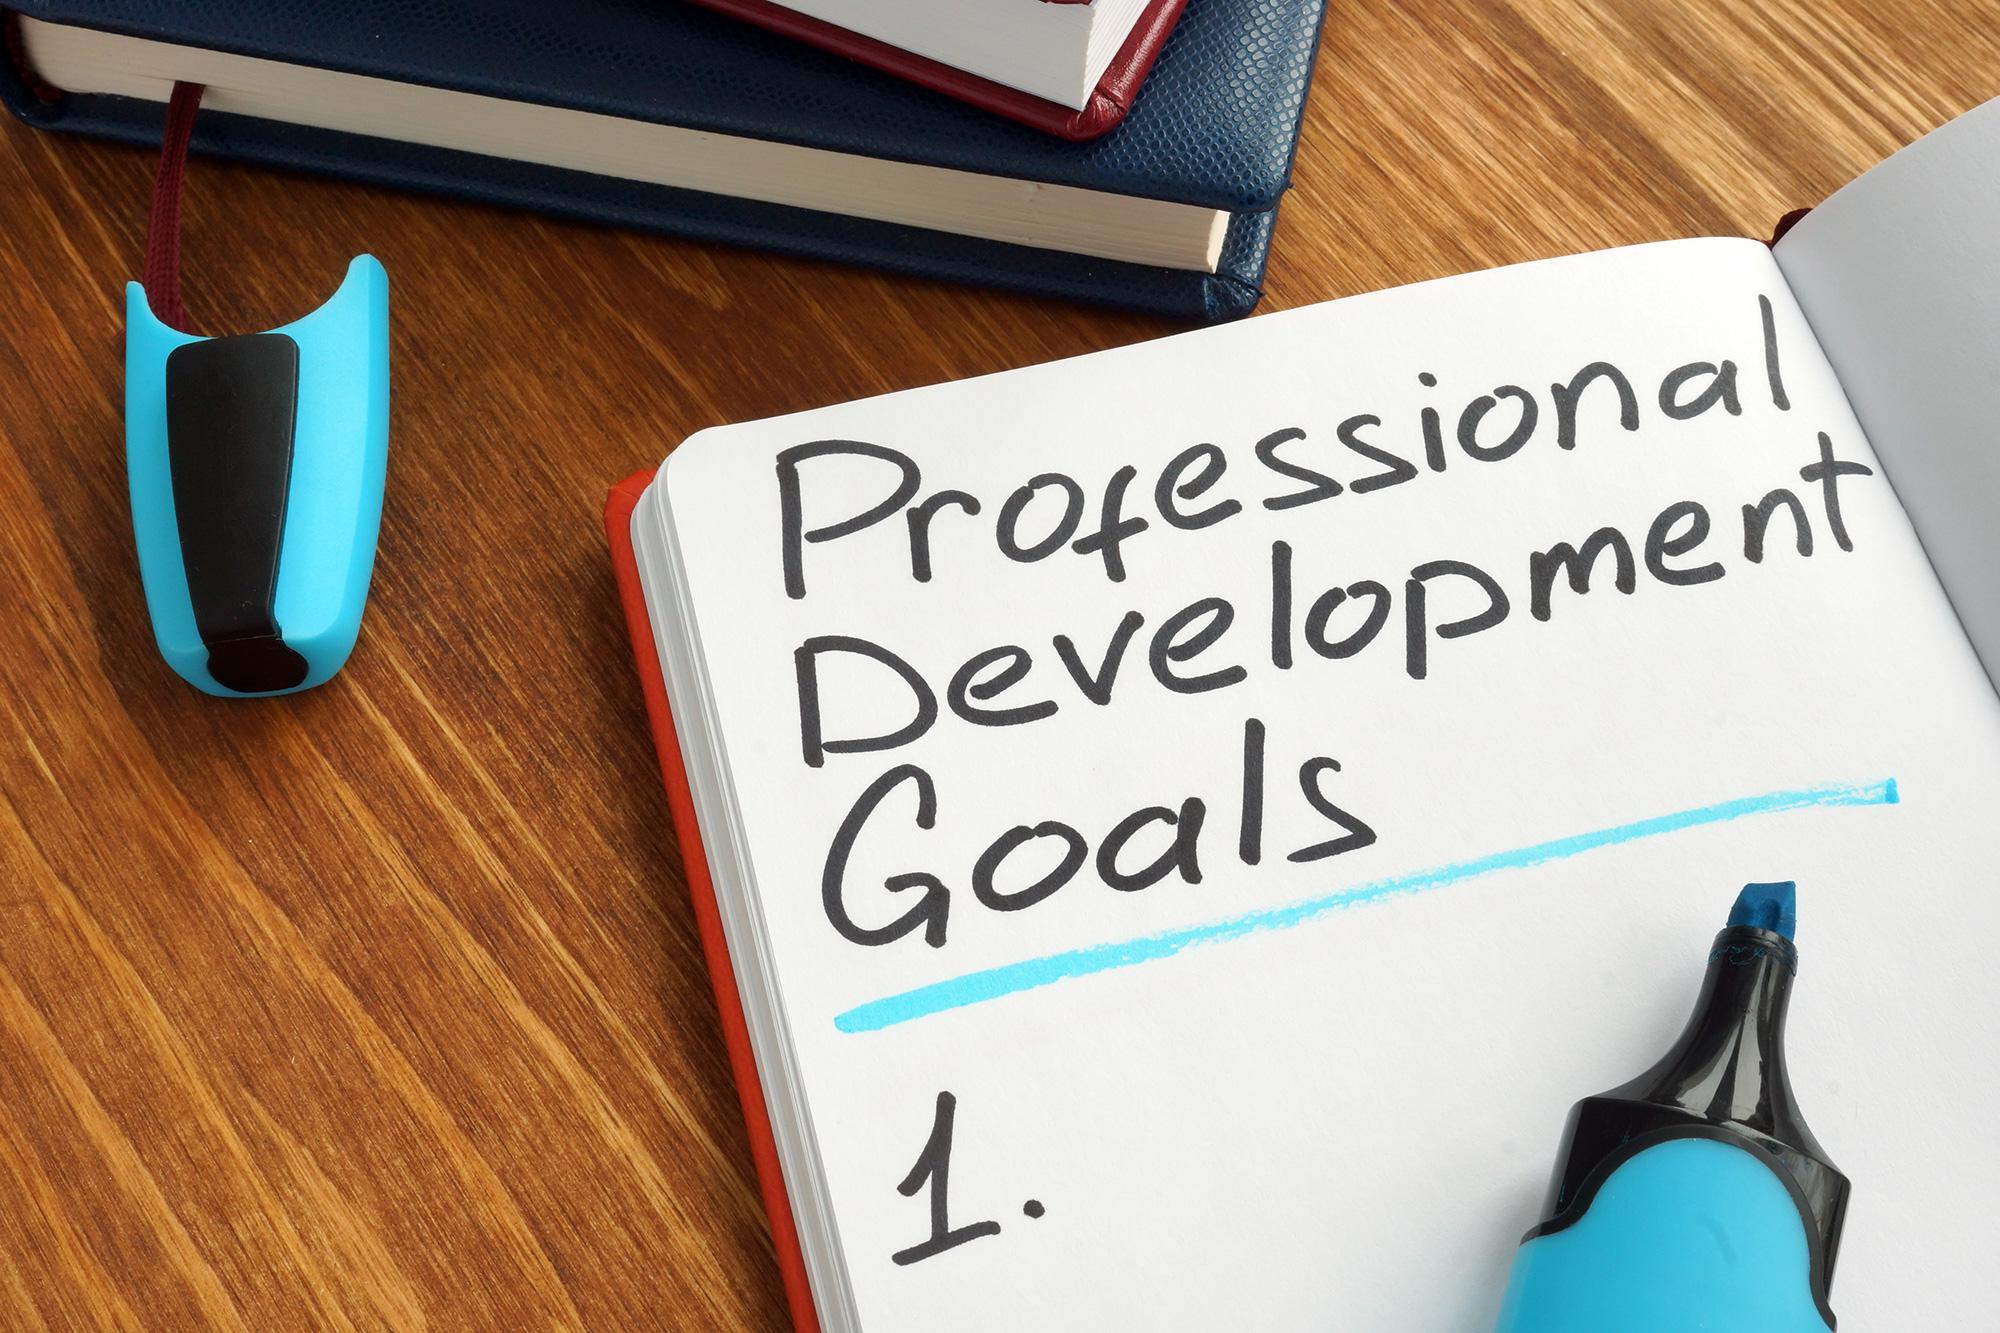 Professional Development, Part 1